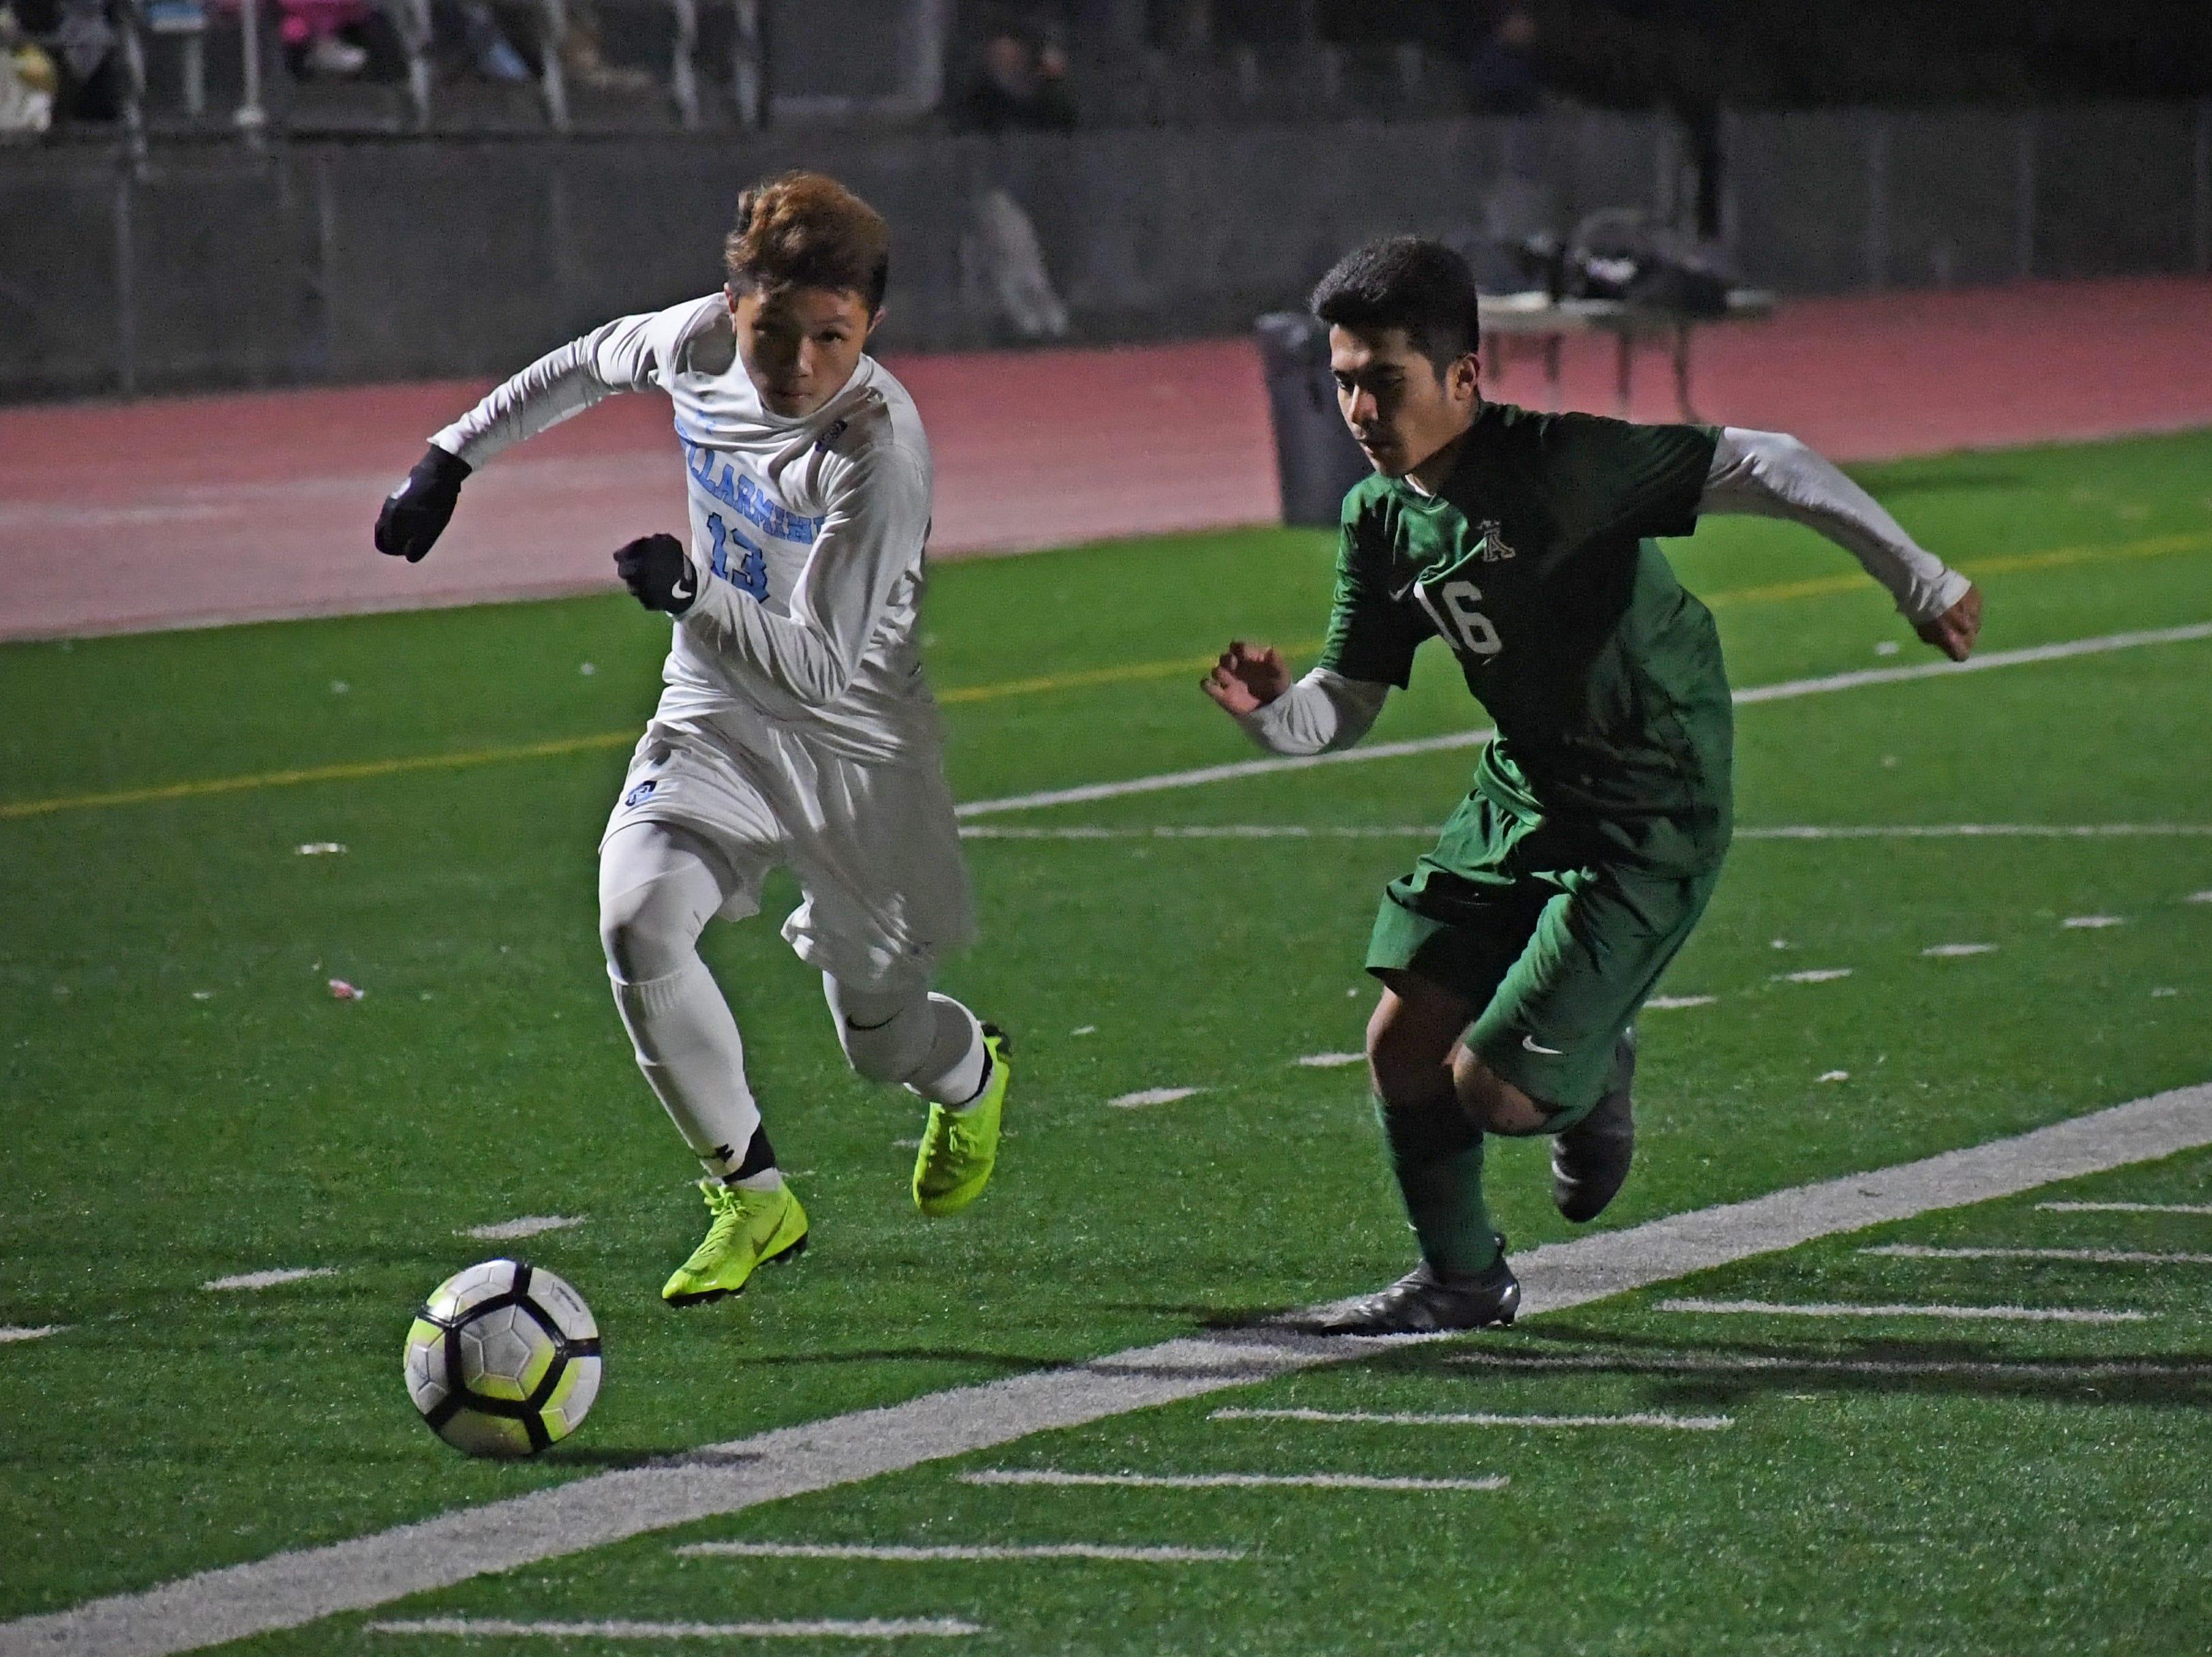 PHOTOS: Alisal vs. Bellarmine Soccer